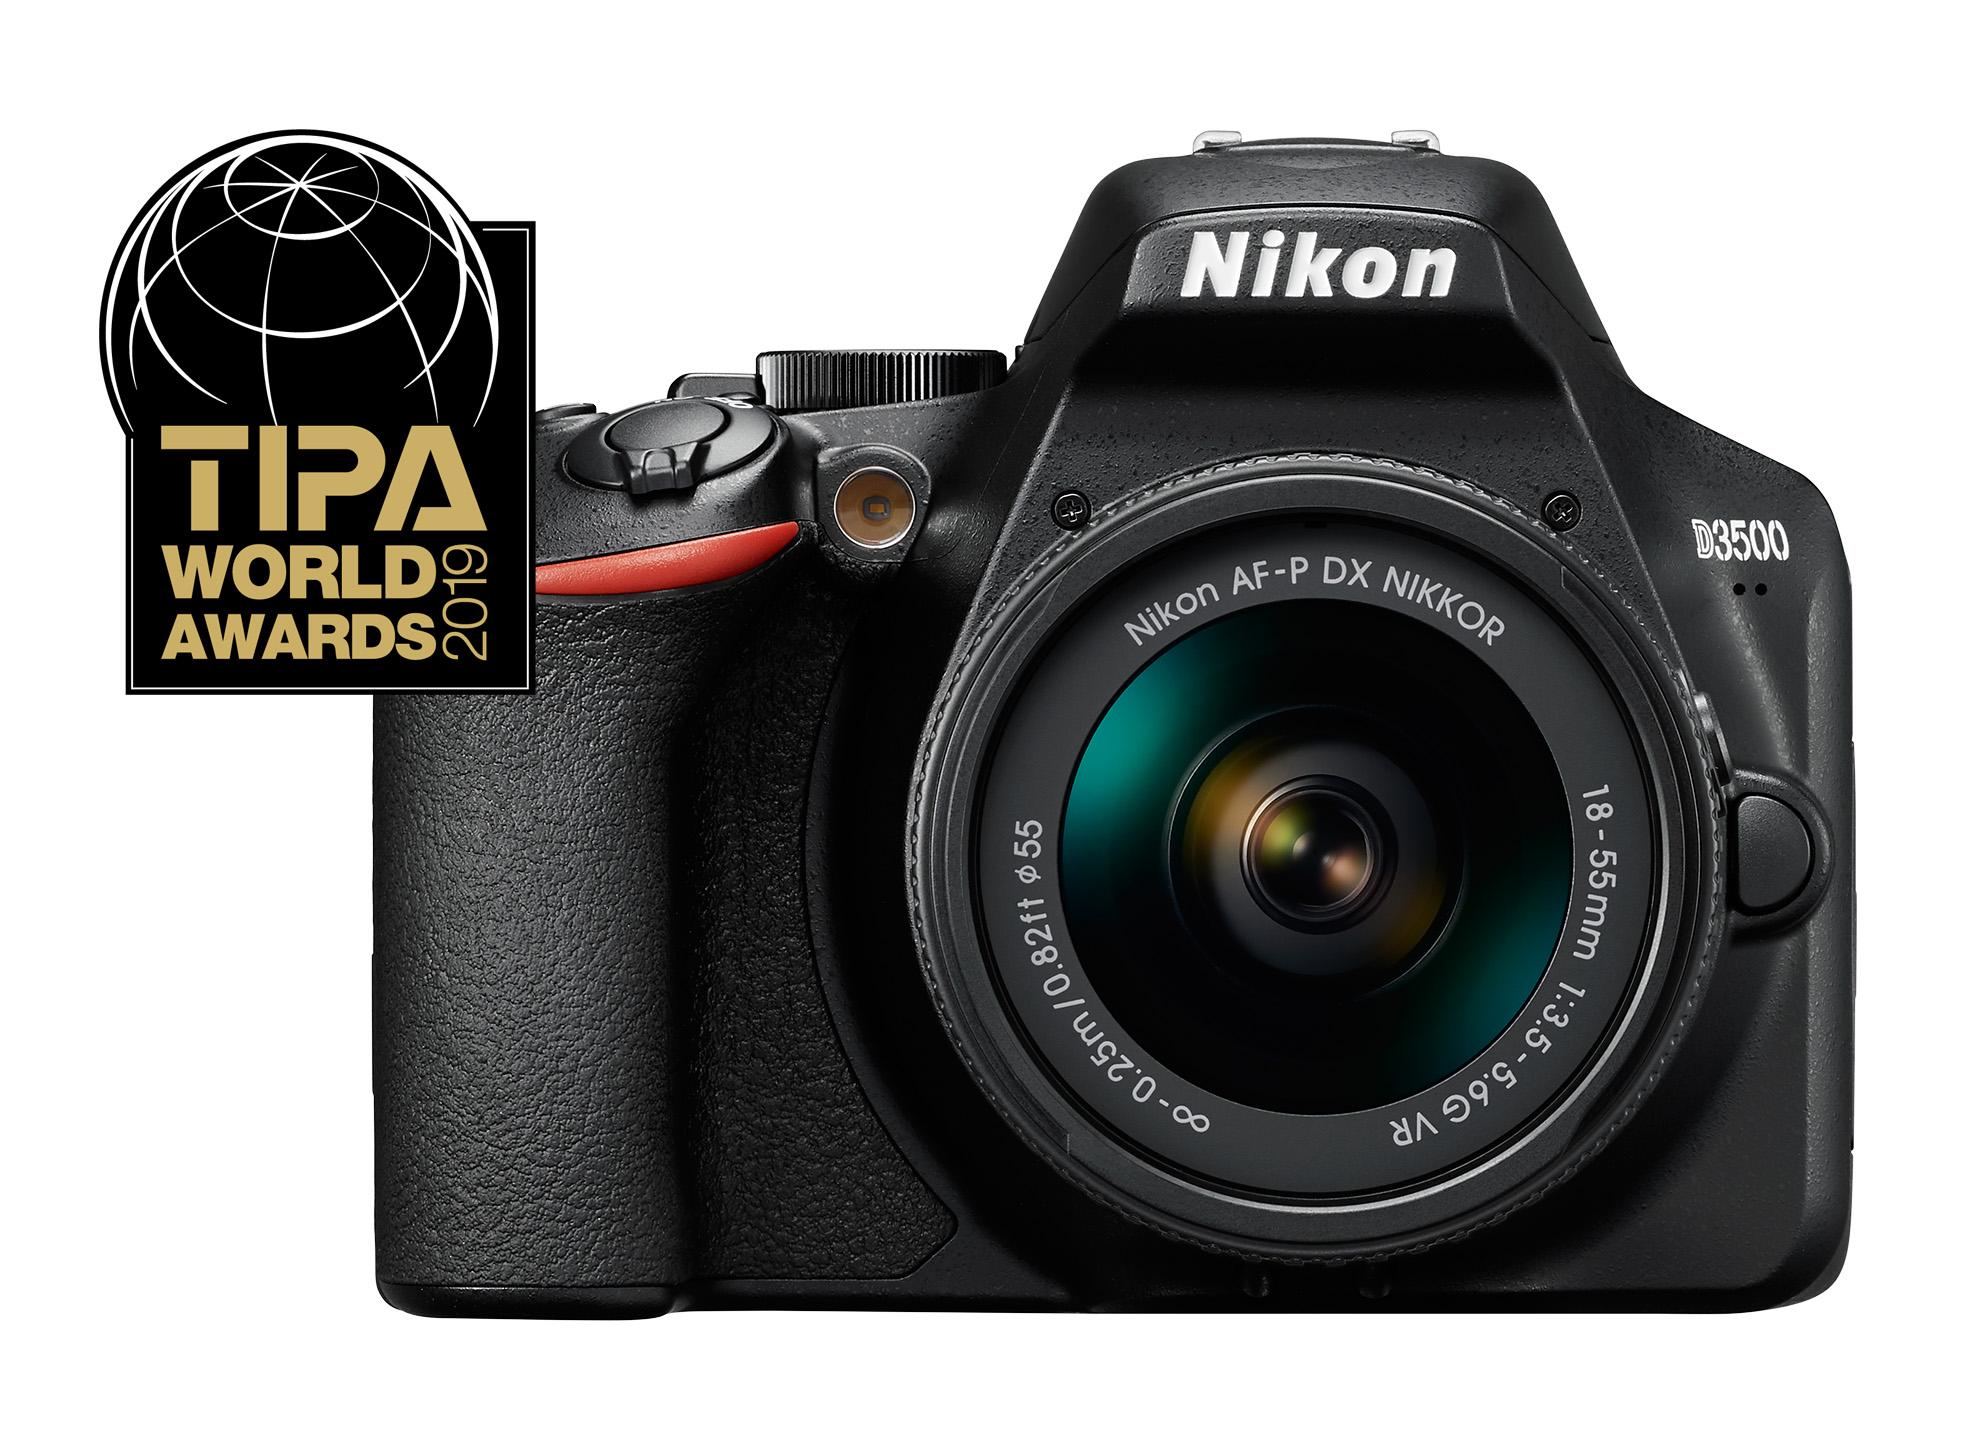 TIPA World Awards 2019 –Nikon D3500 –Best DSLR camera